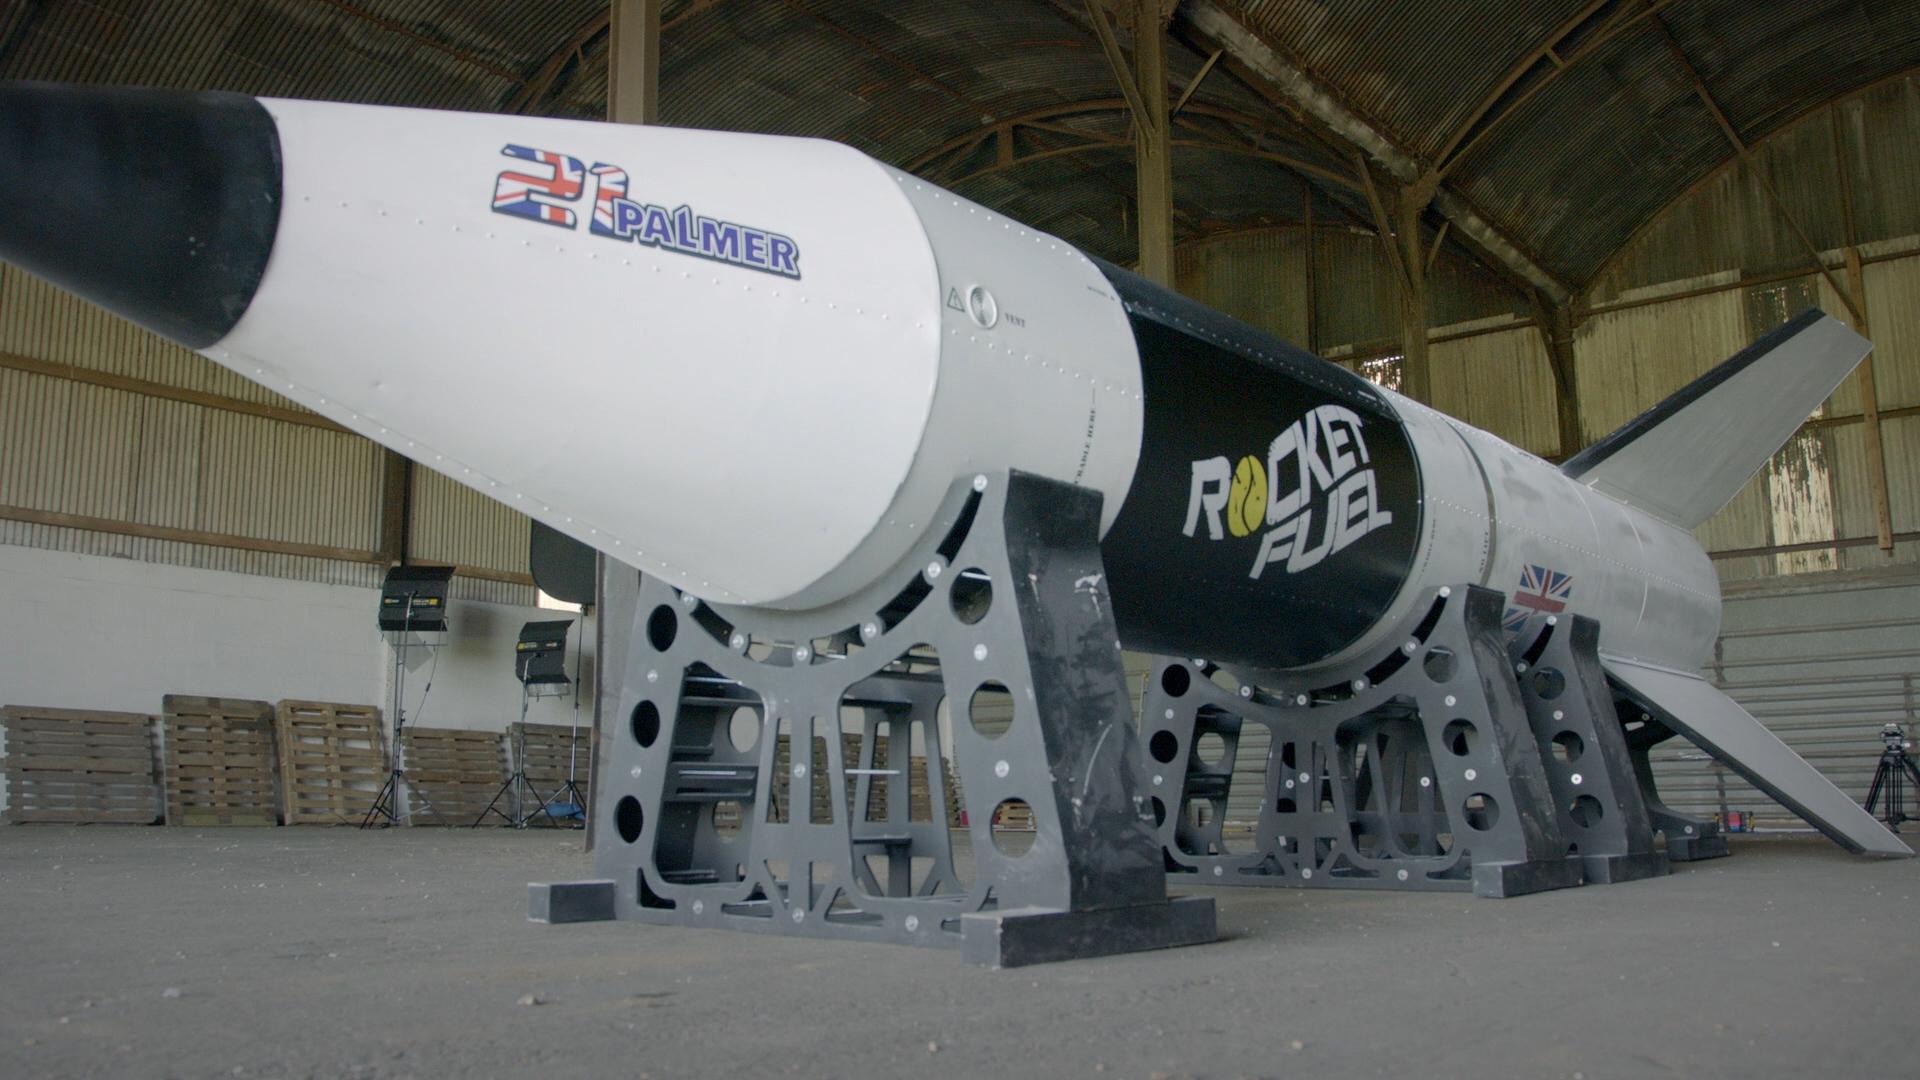 Norfolk's Rocket Man